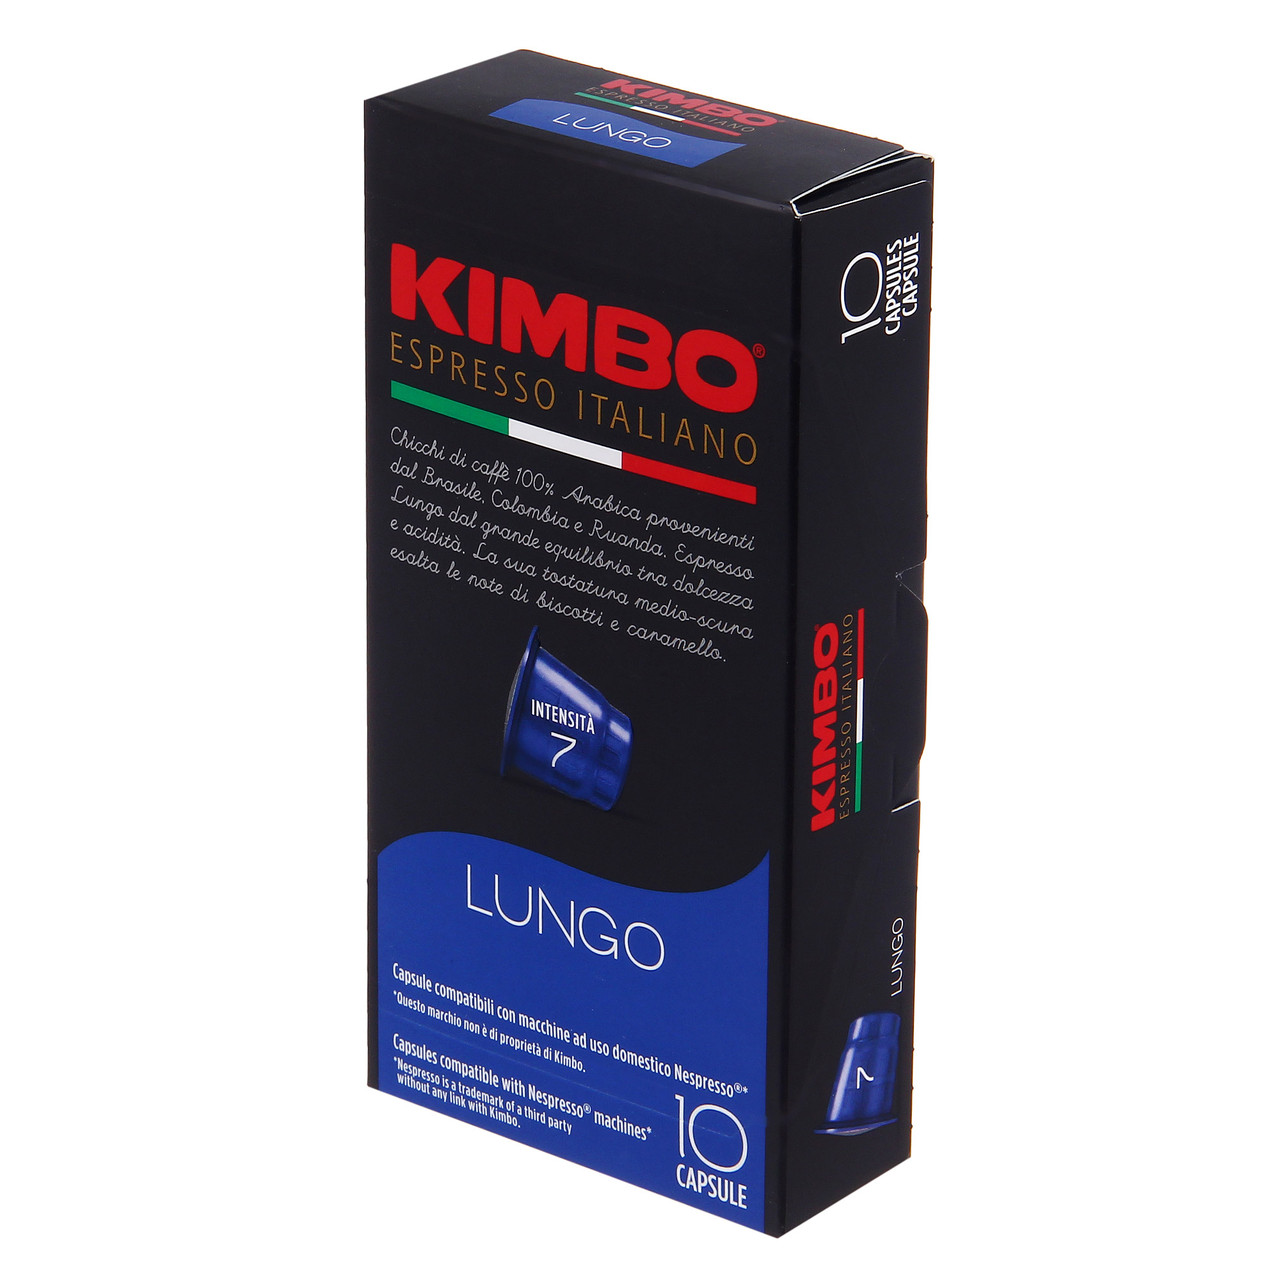 Кава в капсулах Kimbo Nespresso Lungo 7 (10 шт.), Італія (Неспрессо)